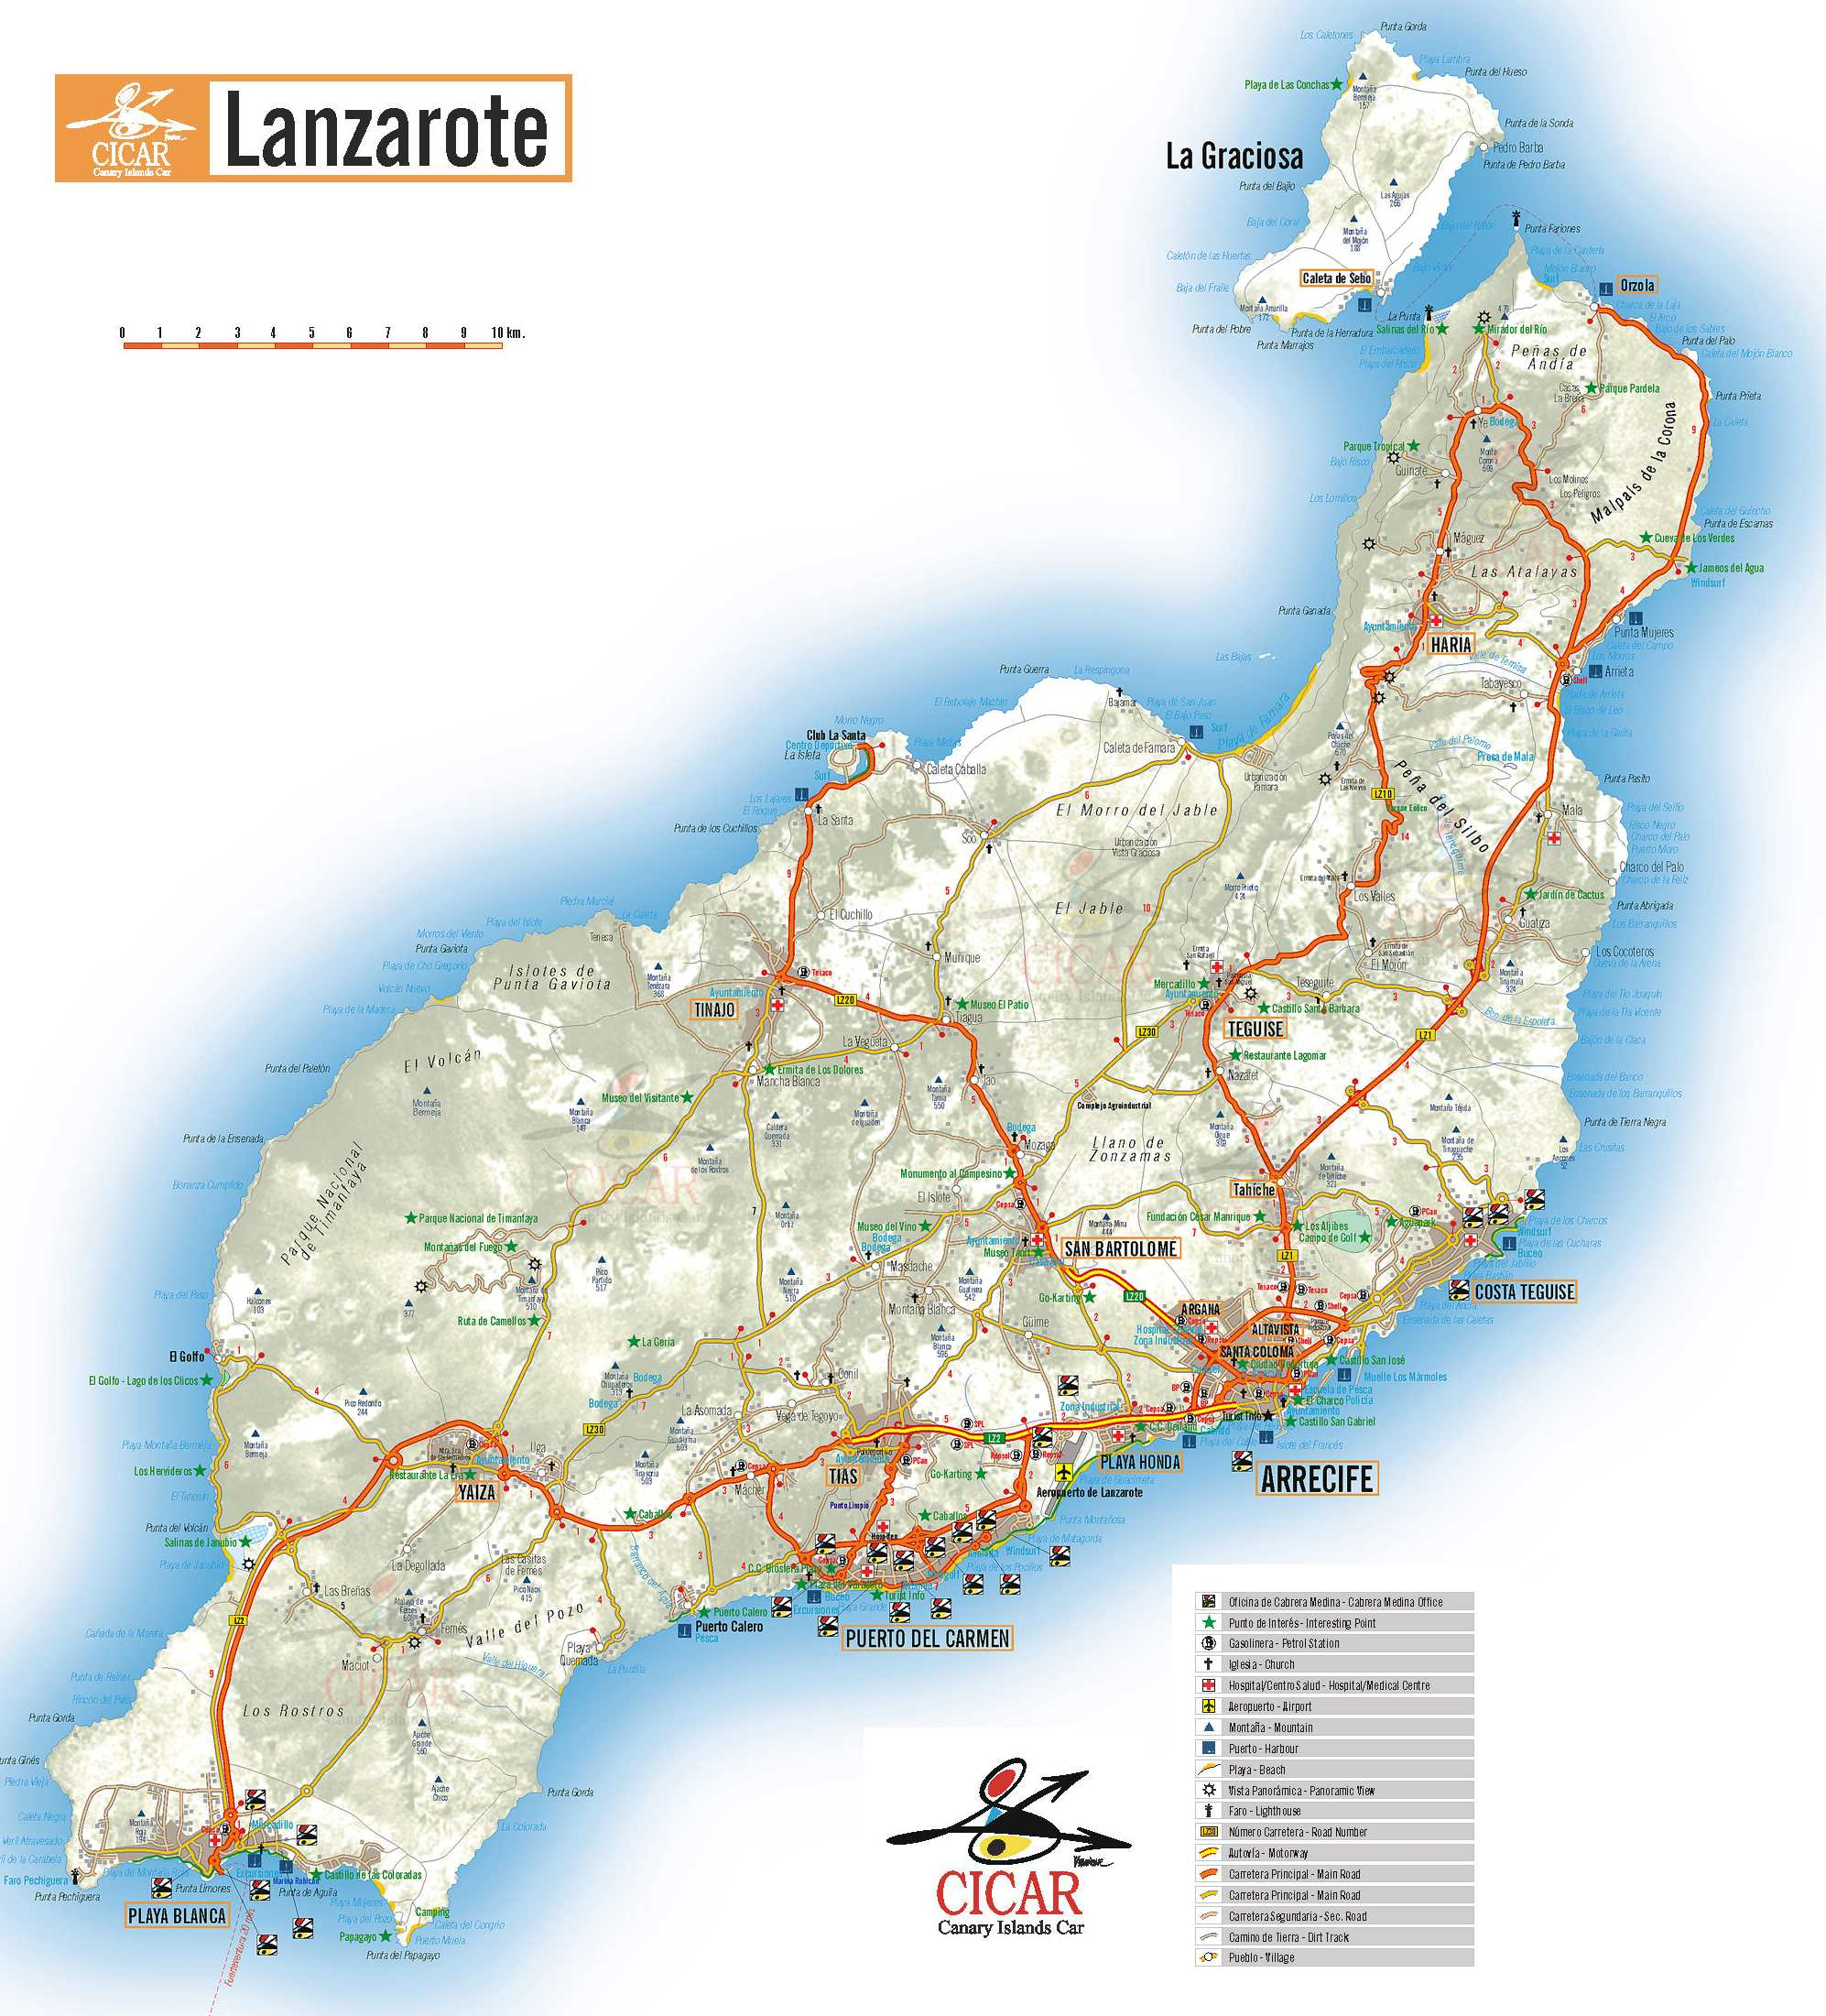 karte lanzarote Karte Lanzarote   grosse Lanzarote Karte karte lanzarote